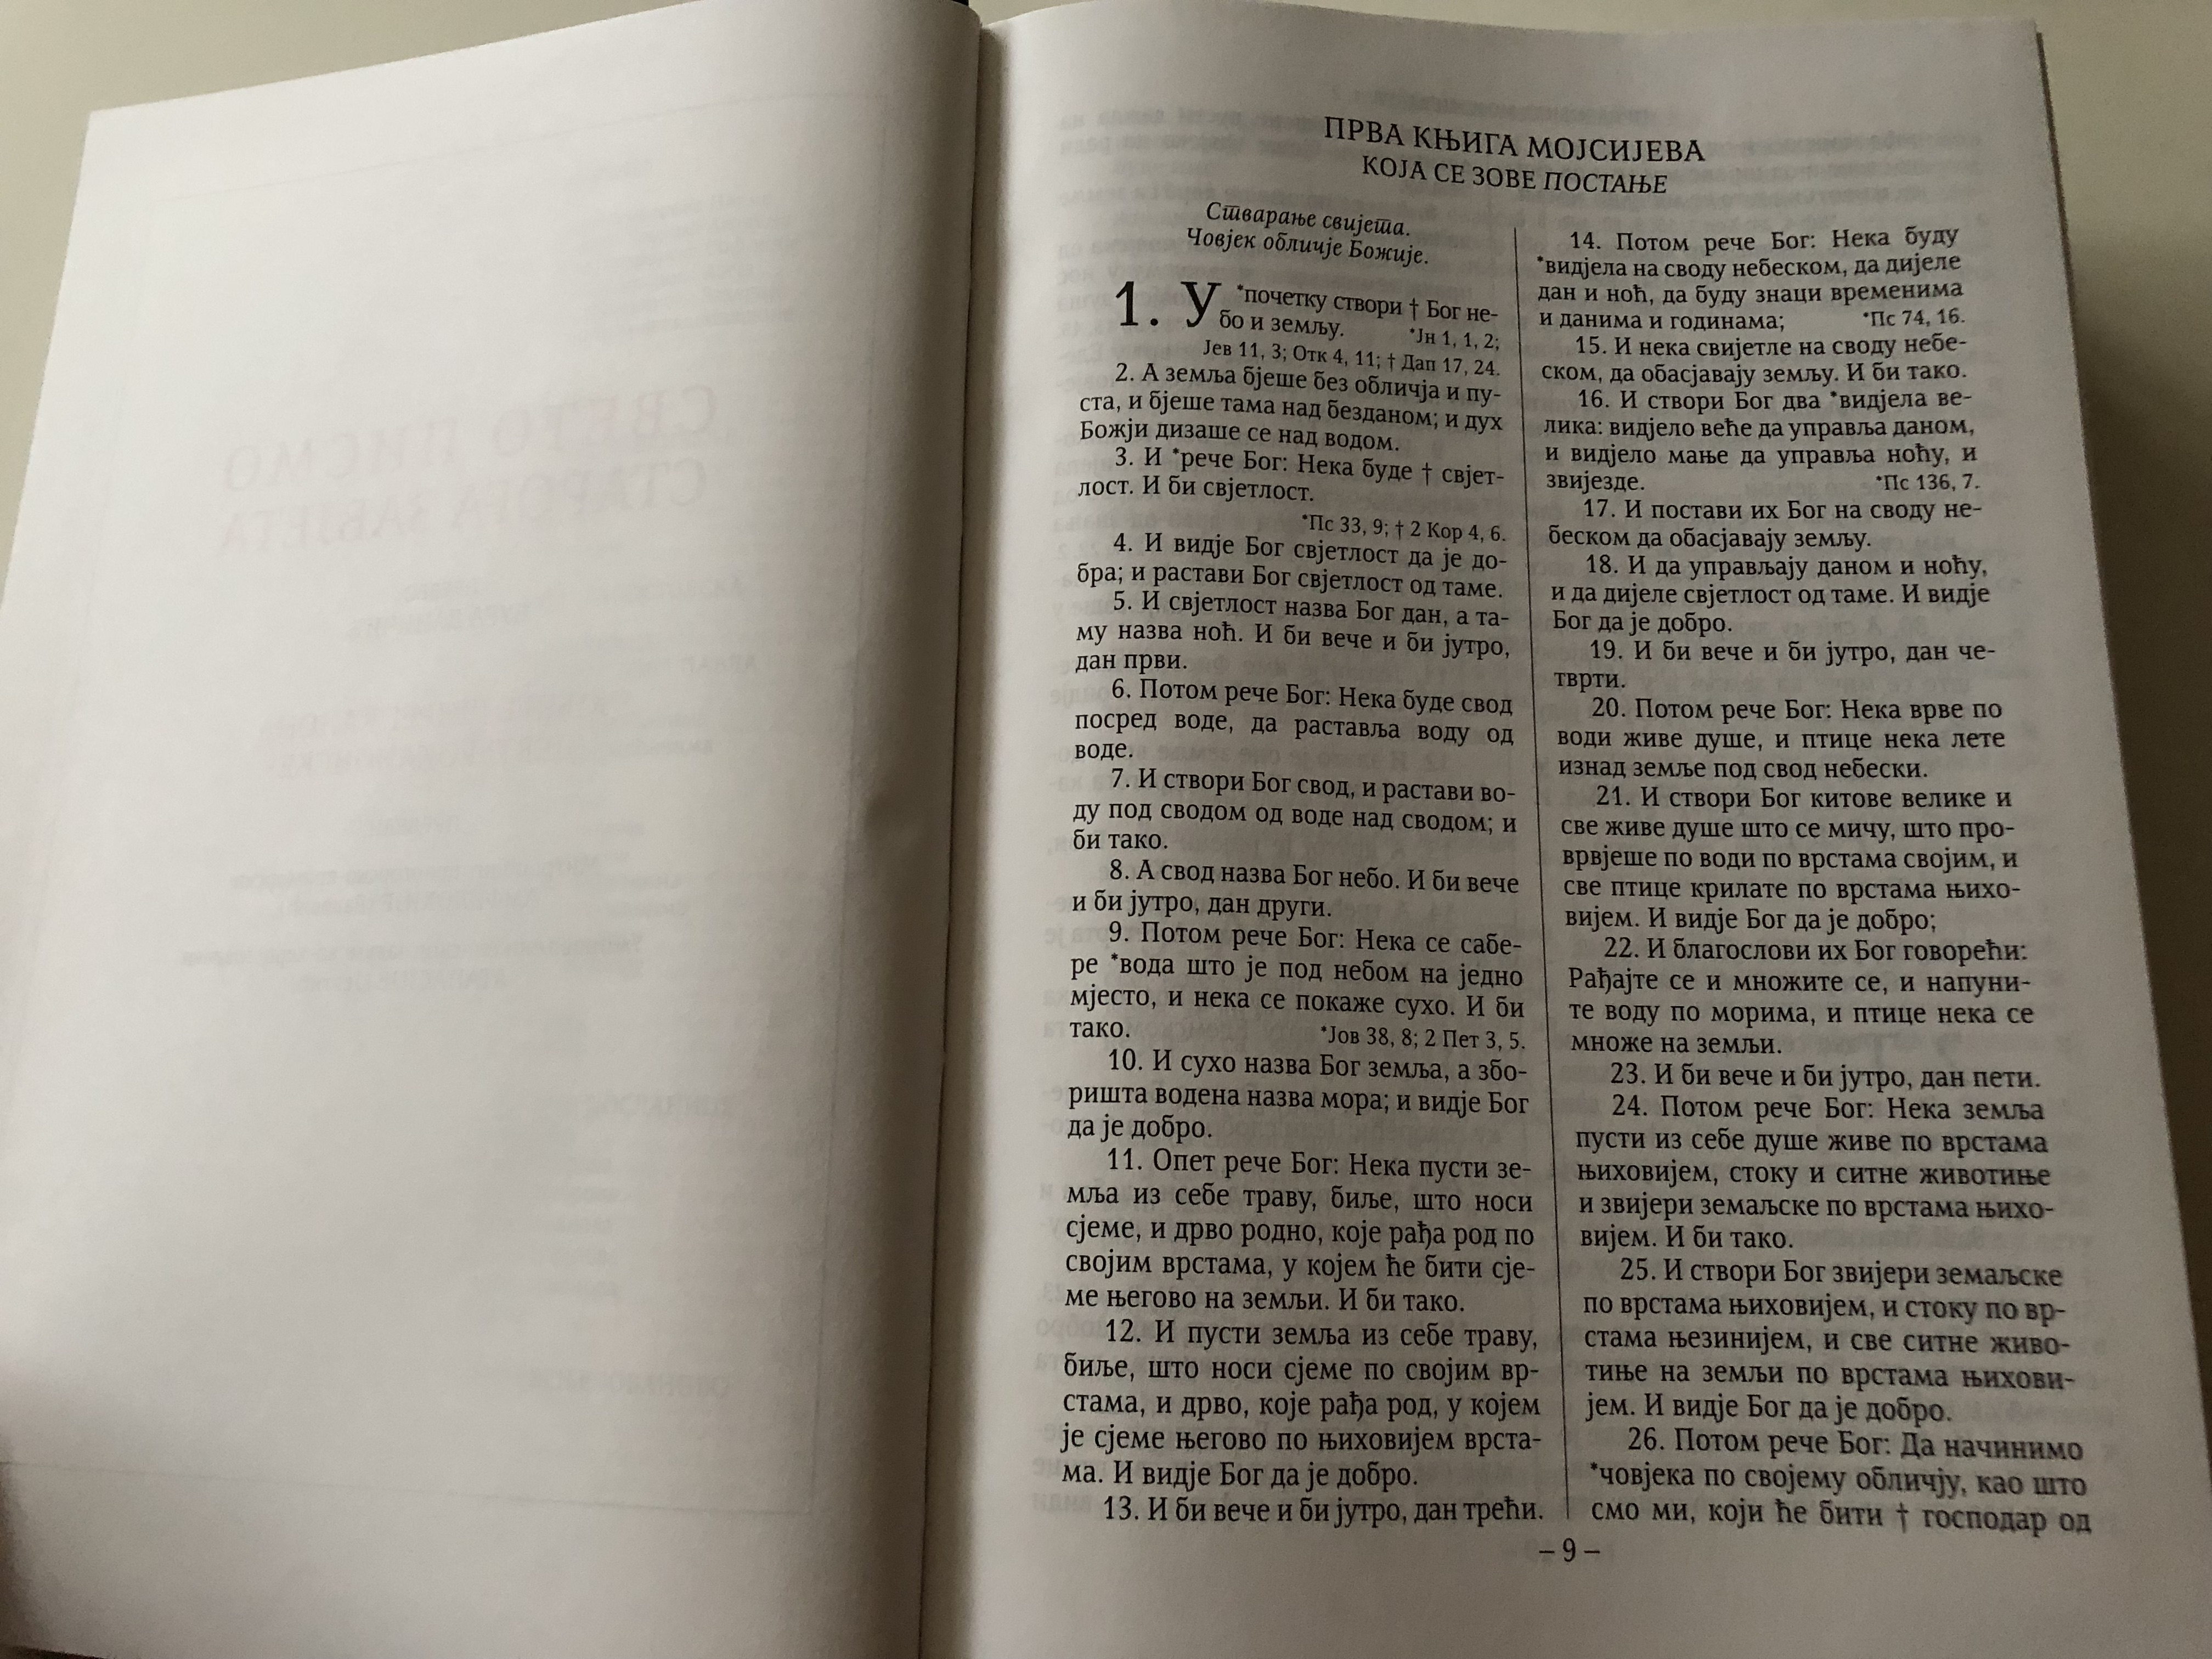 serbian-bible-black-gold-etched-deuterocanonical-7-.jpg